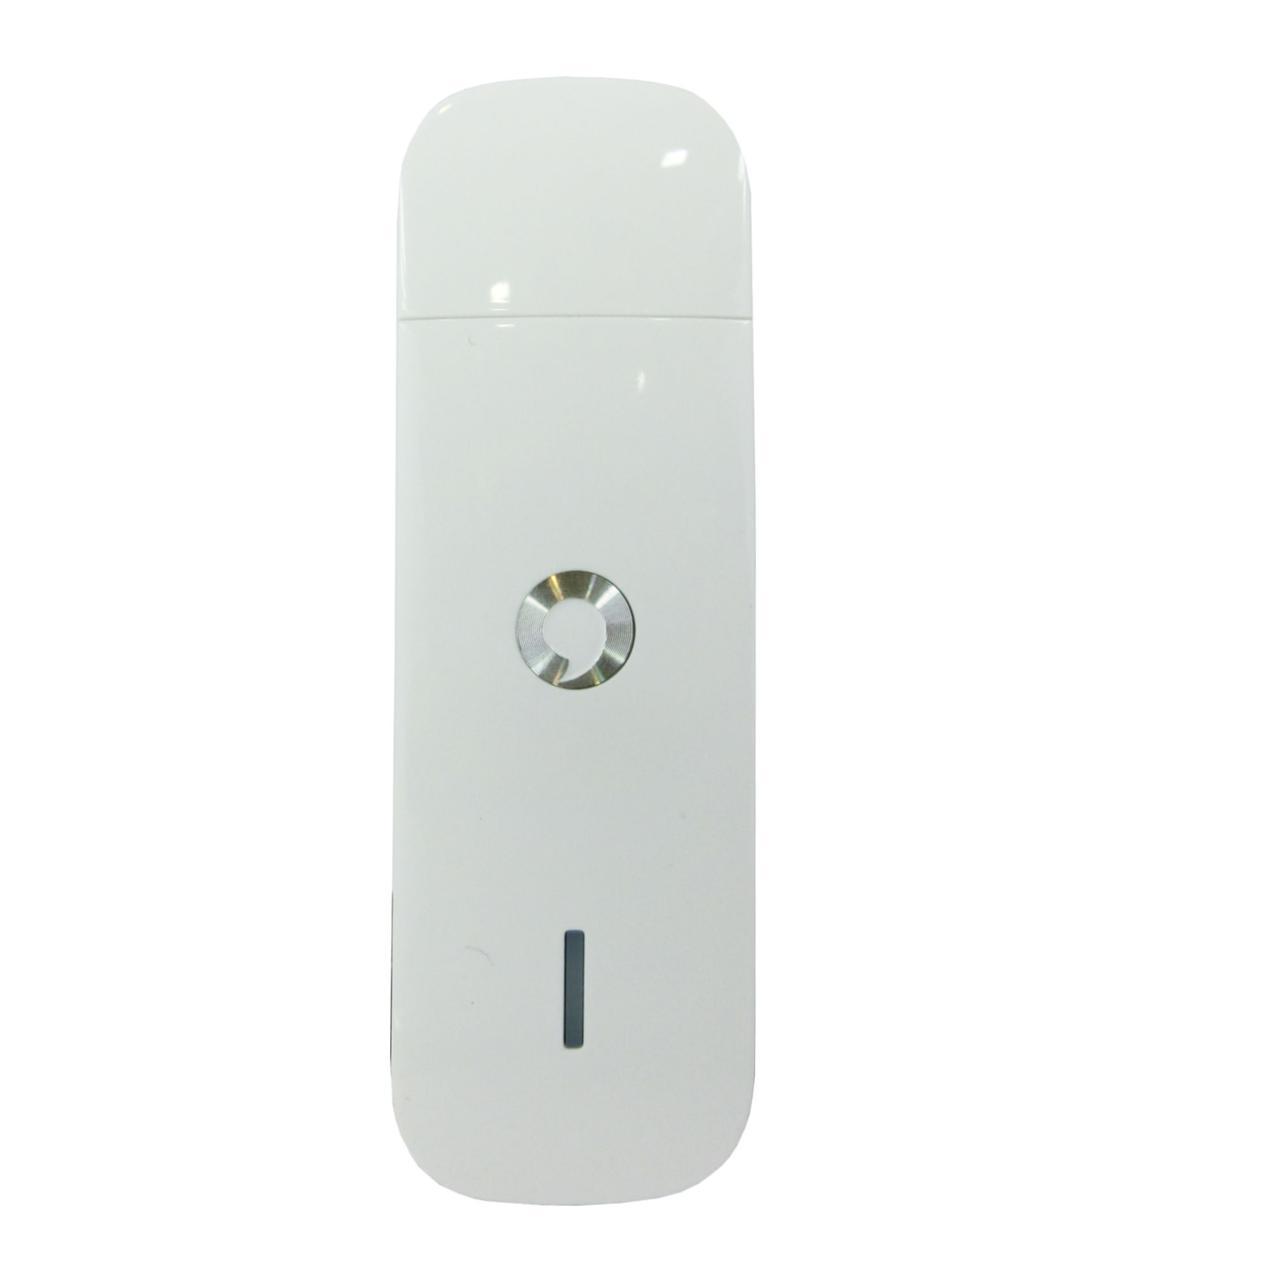 3G USB модем Huawei K4510